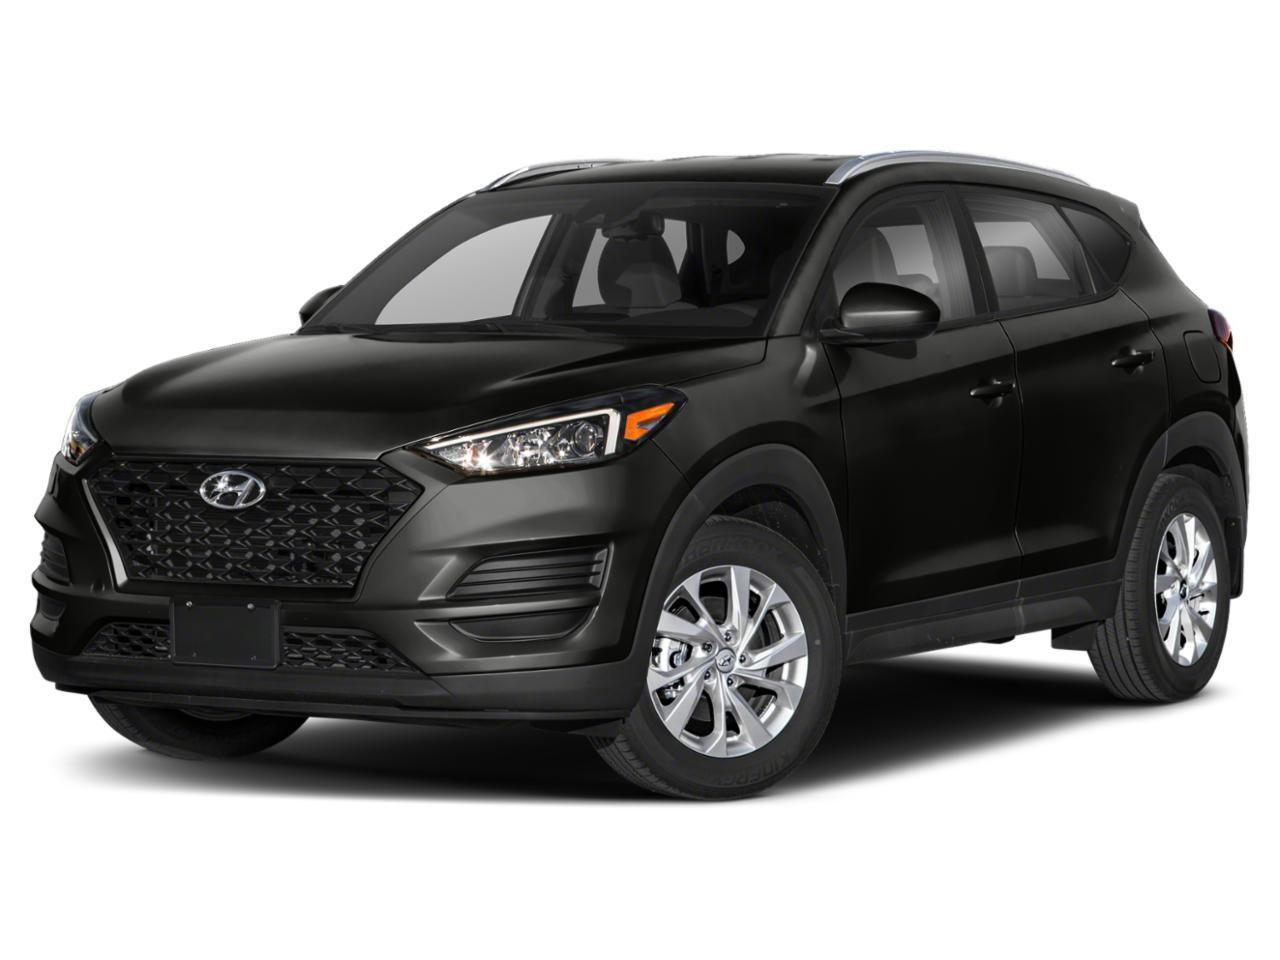 2019 Hyundai Tucson Vehicle Photo in Nashua, NH 03060